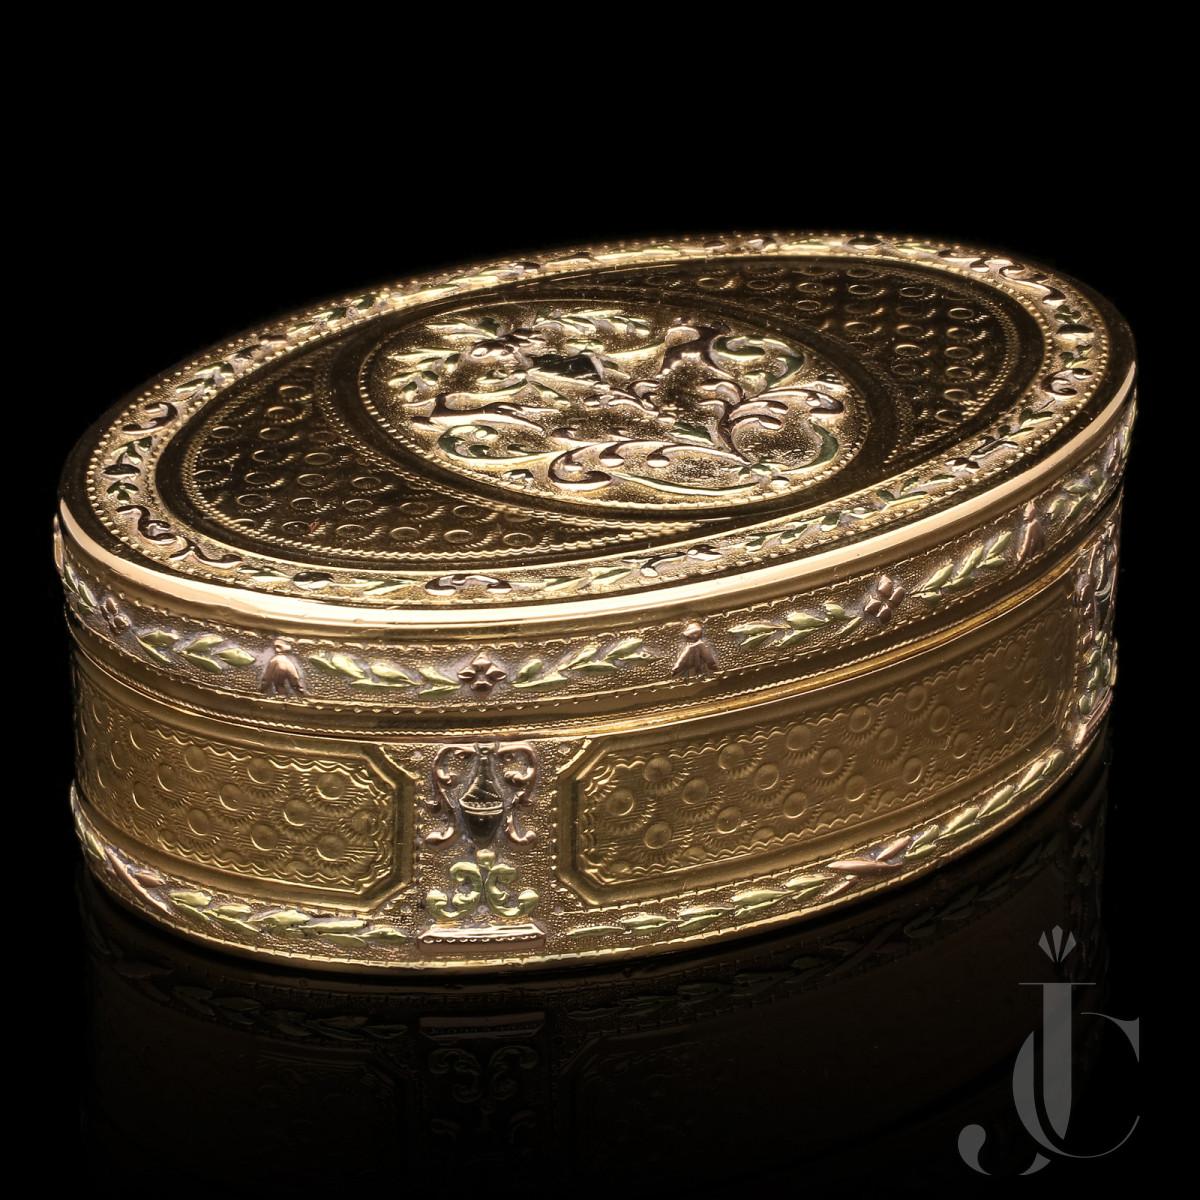 French 3 Colour Gold Snuff Box c.1780/82